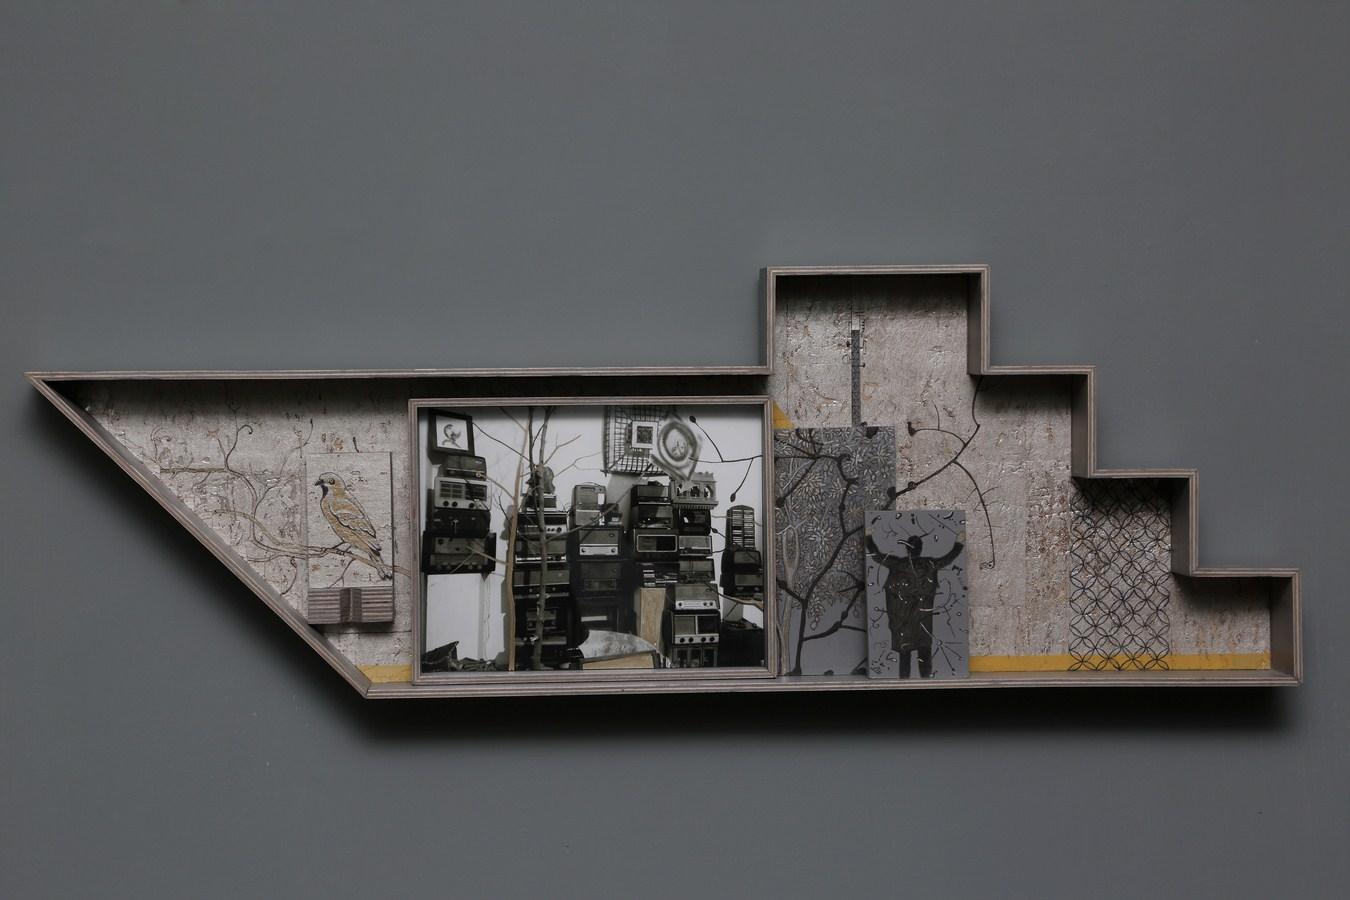 "Dweller of Metropolis - V | Photograph, plywood, wood, acrylic, wallpaper, auto paint | 12.5"" x 37.5"" | 2017"